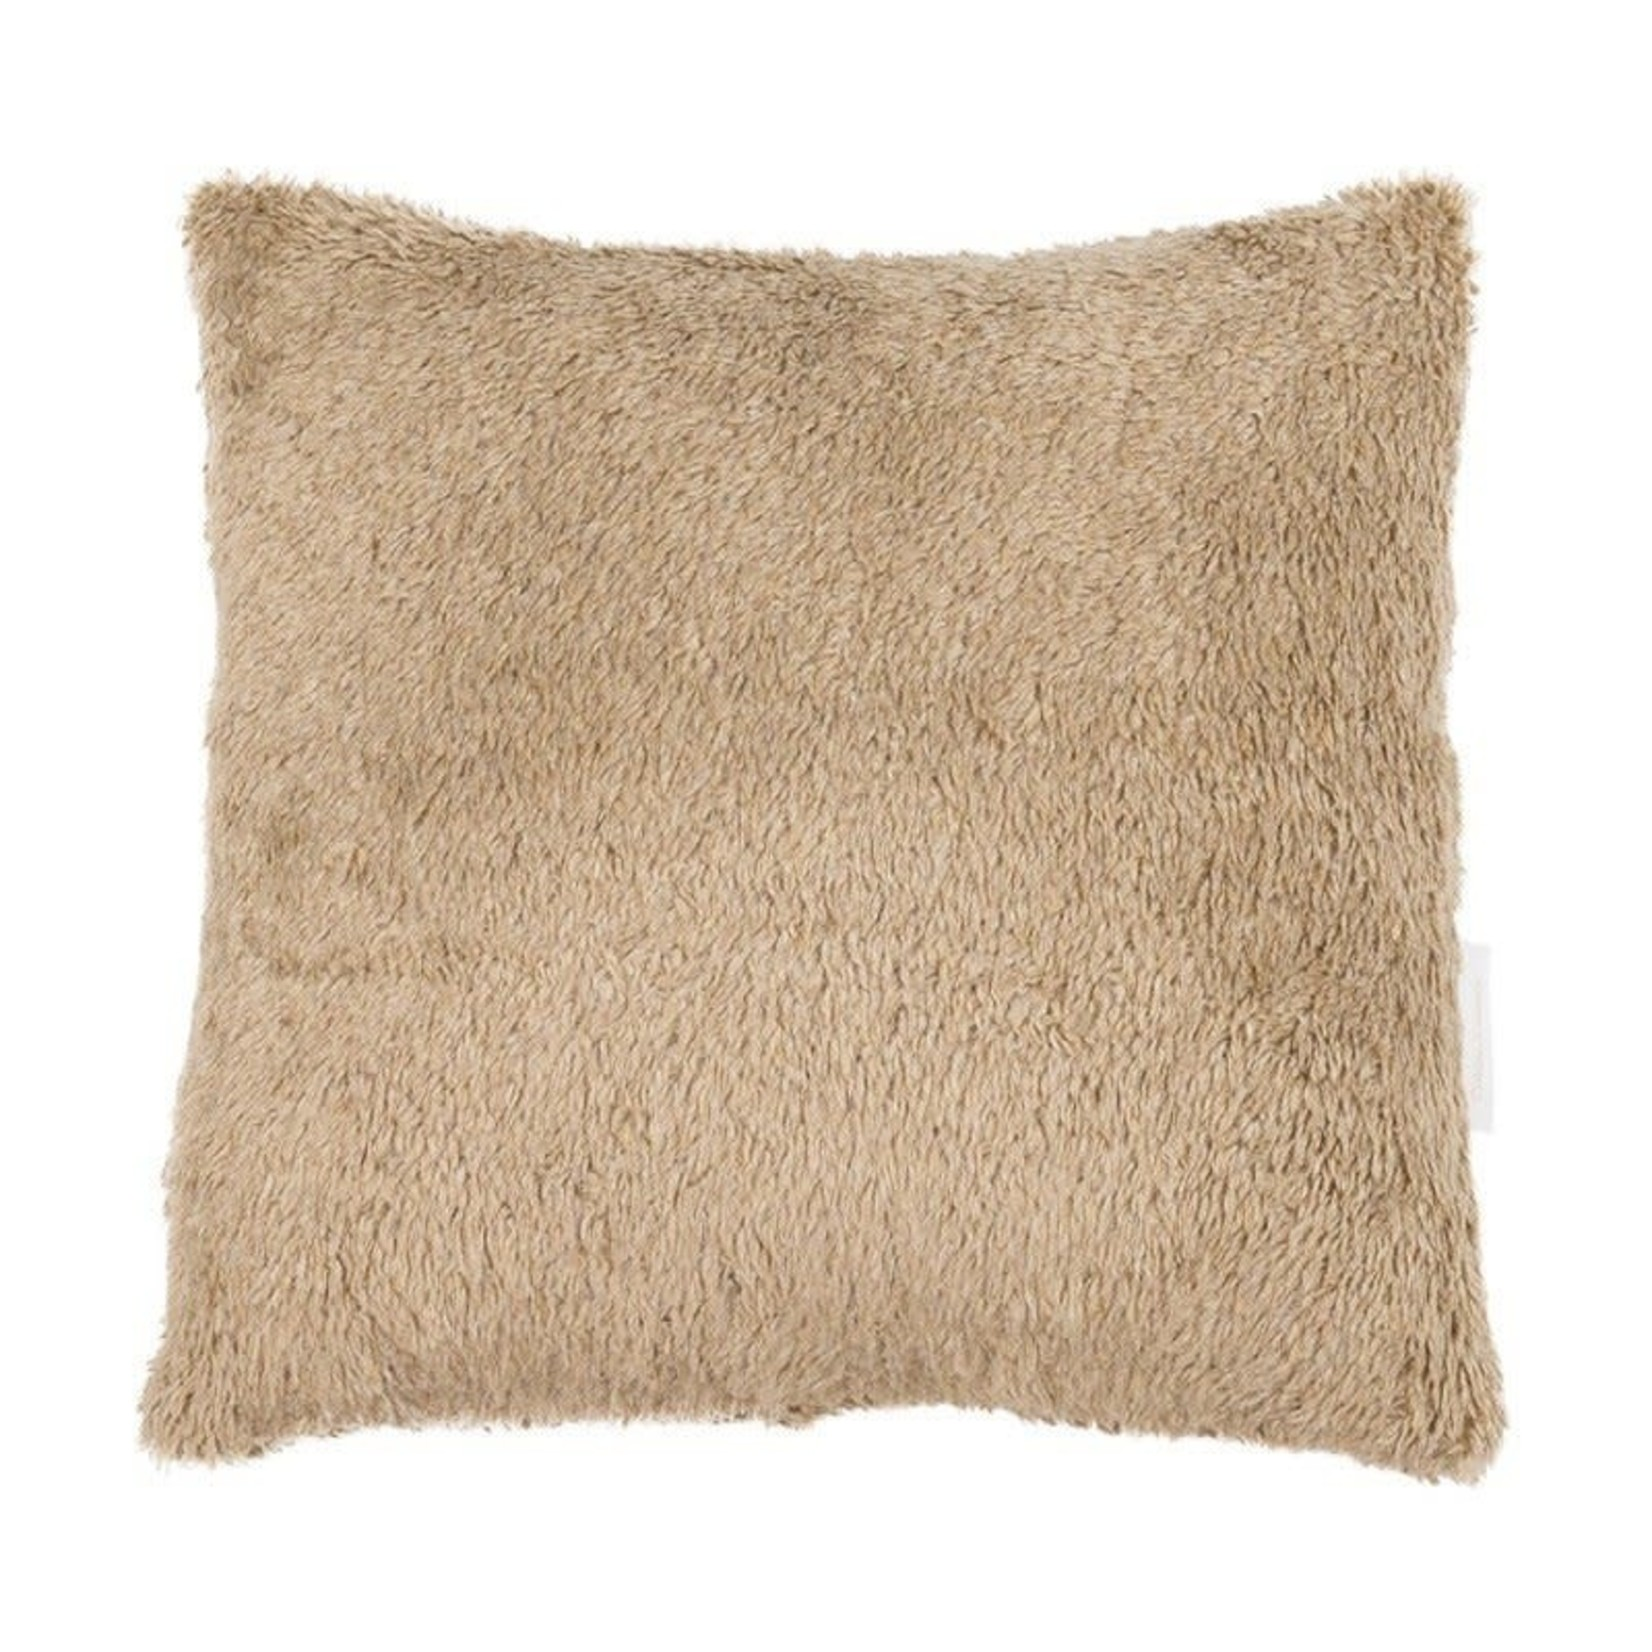 Cotton & Sweets Sheepskin Boho Pillow